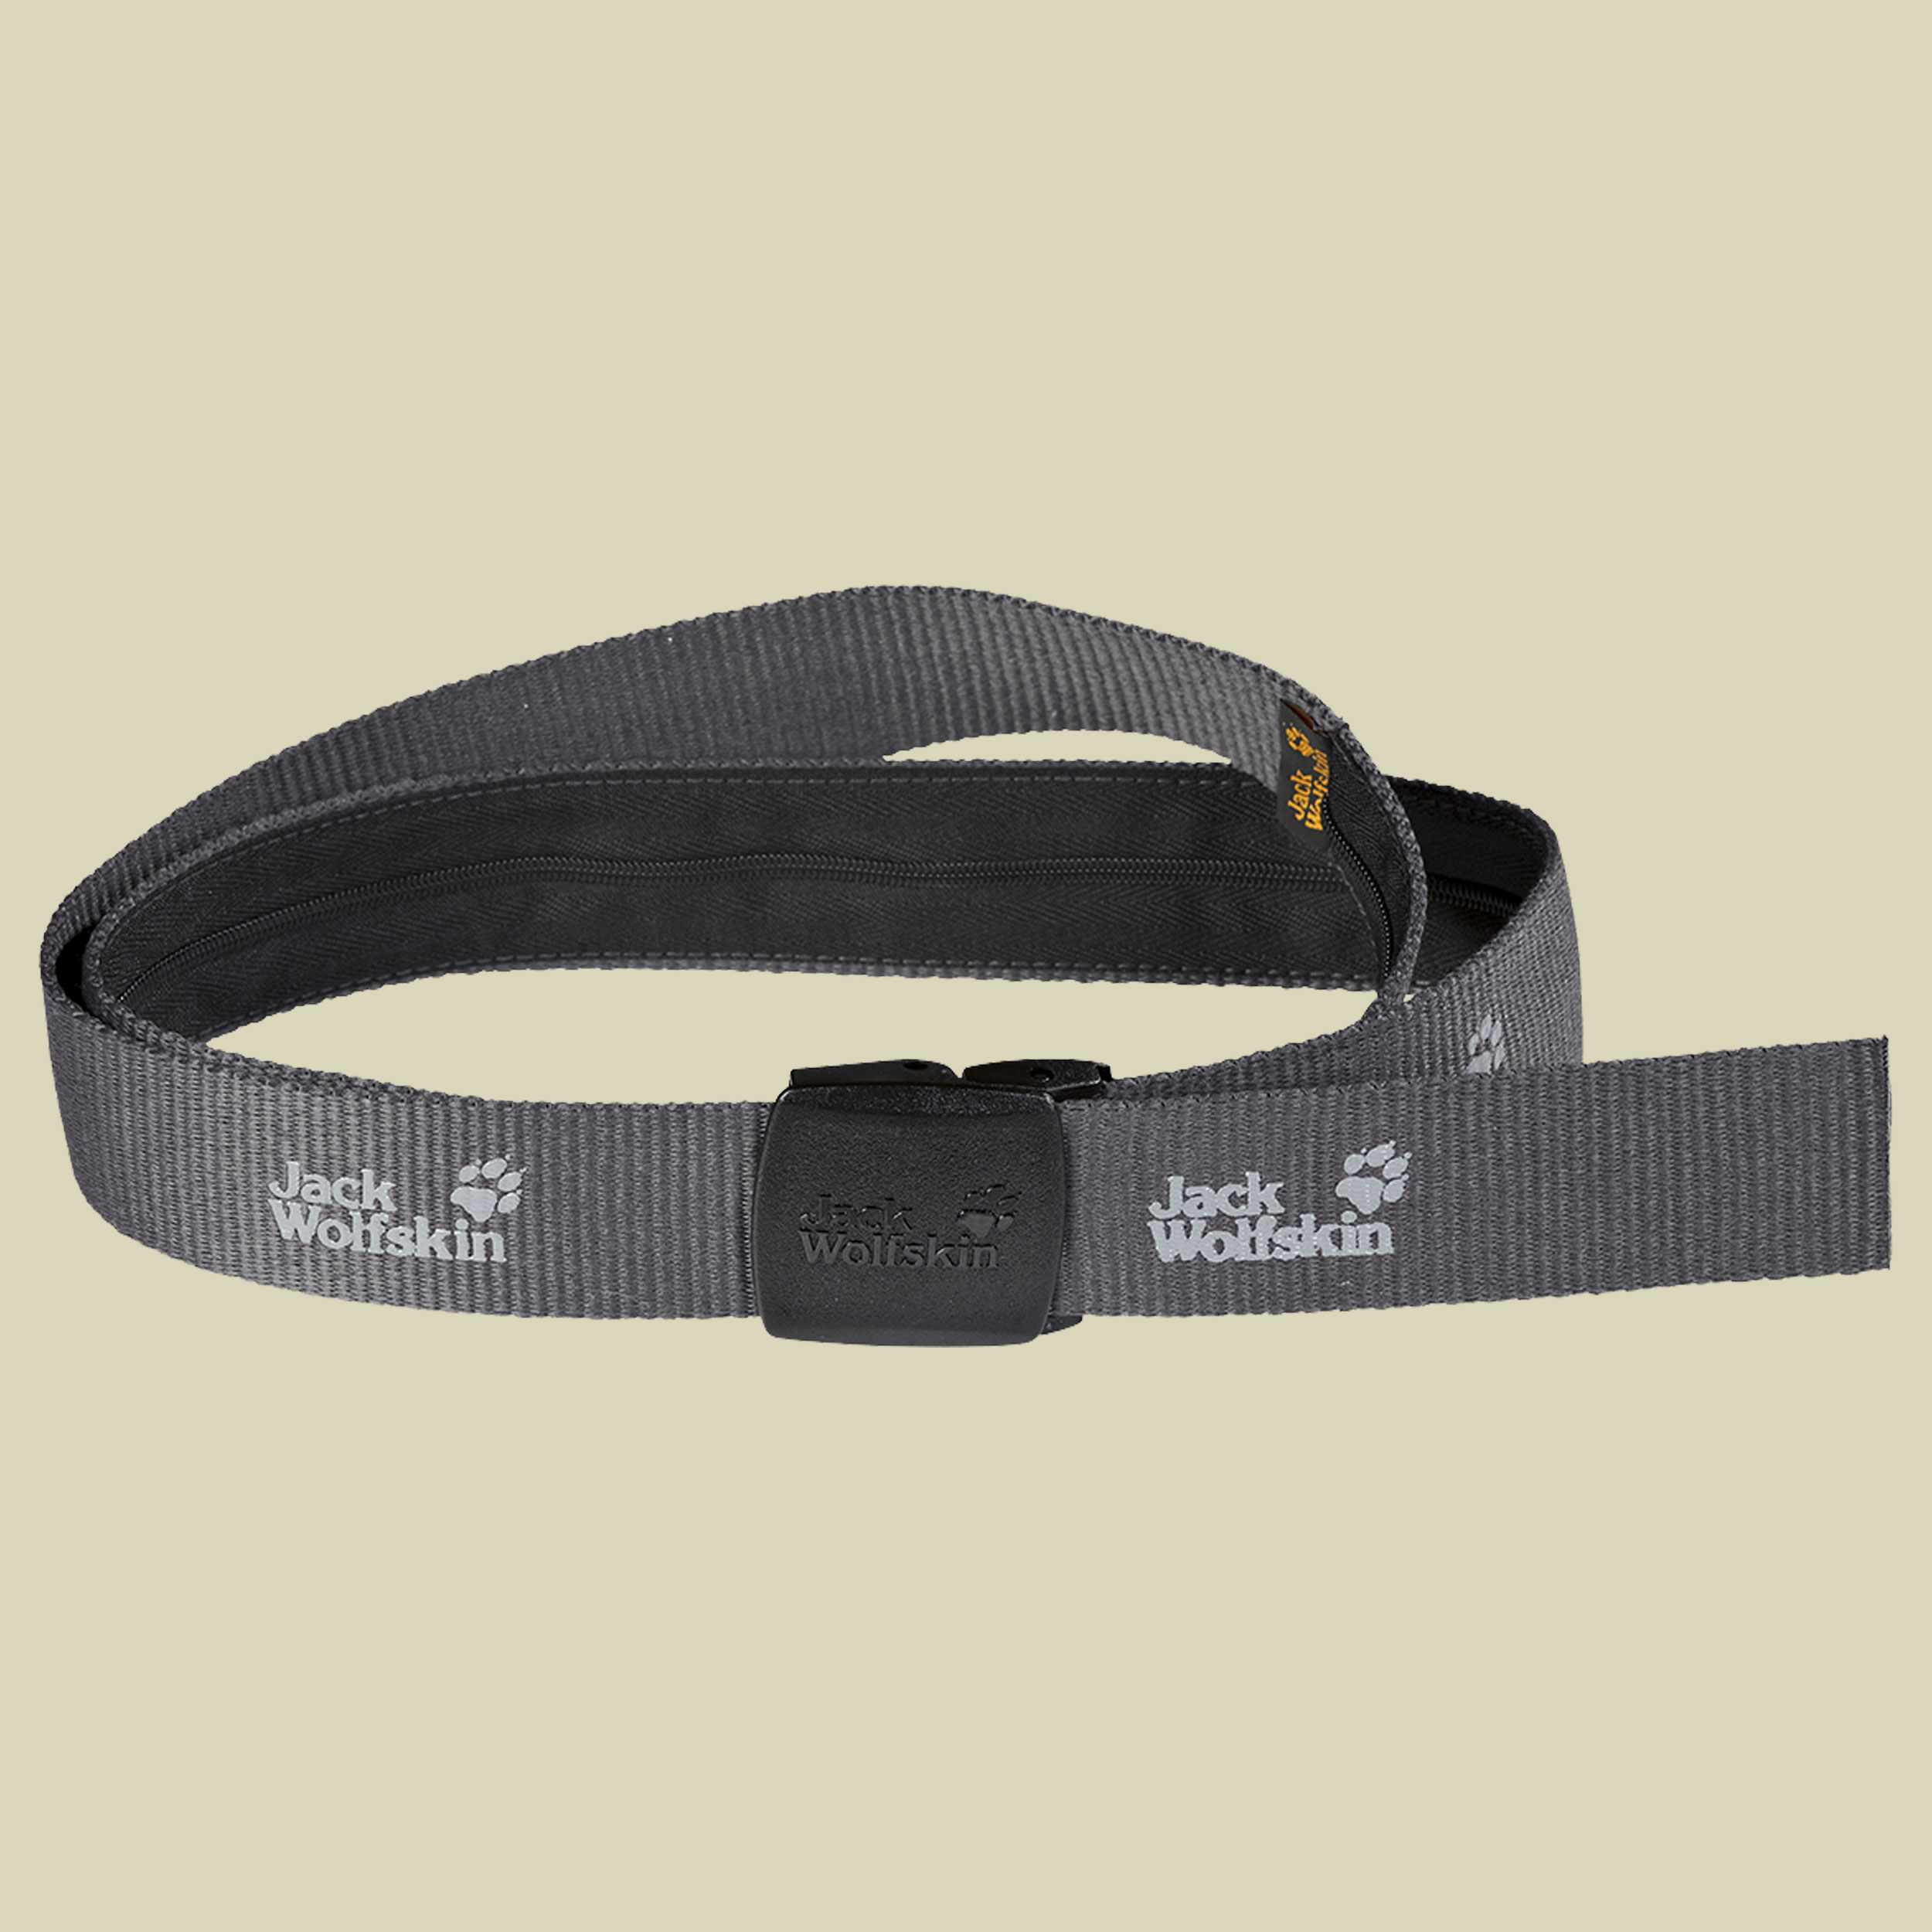 Jack Wolfskin Secret Belt Wide Gürtel Länge 125cm dark steel